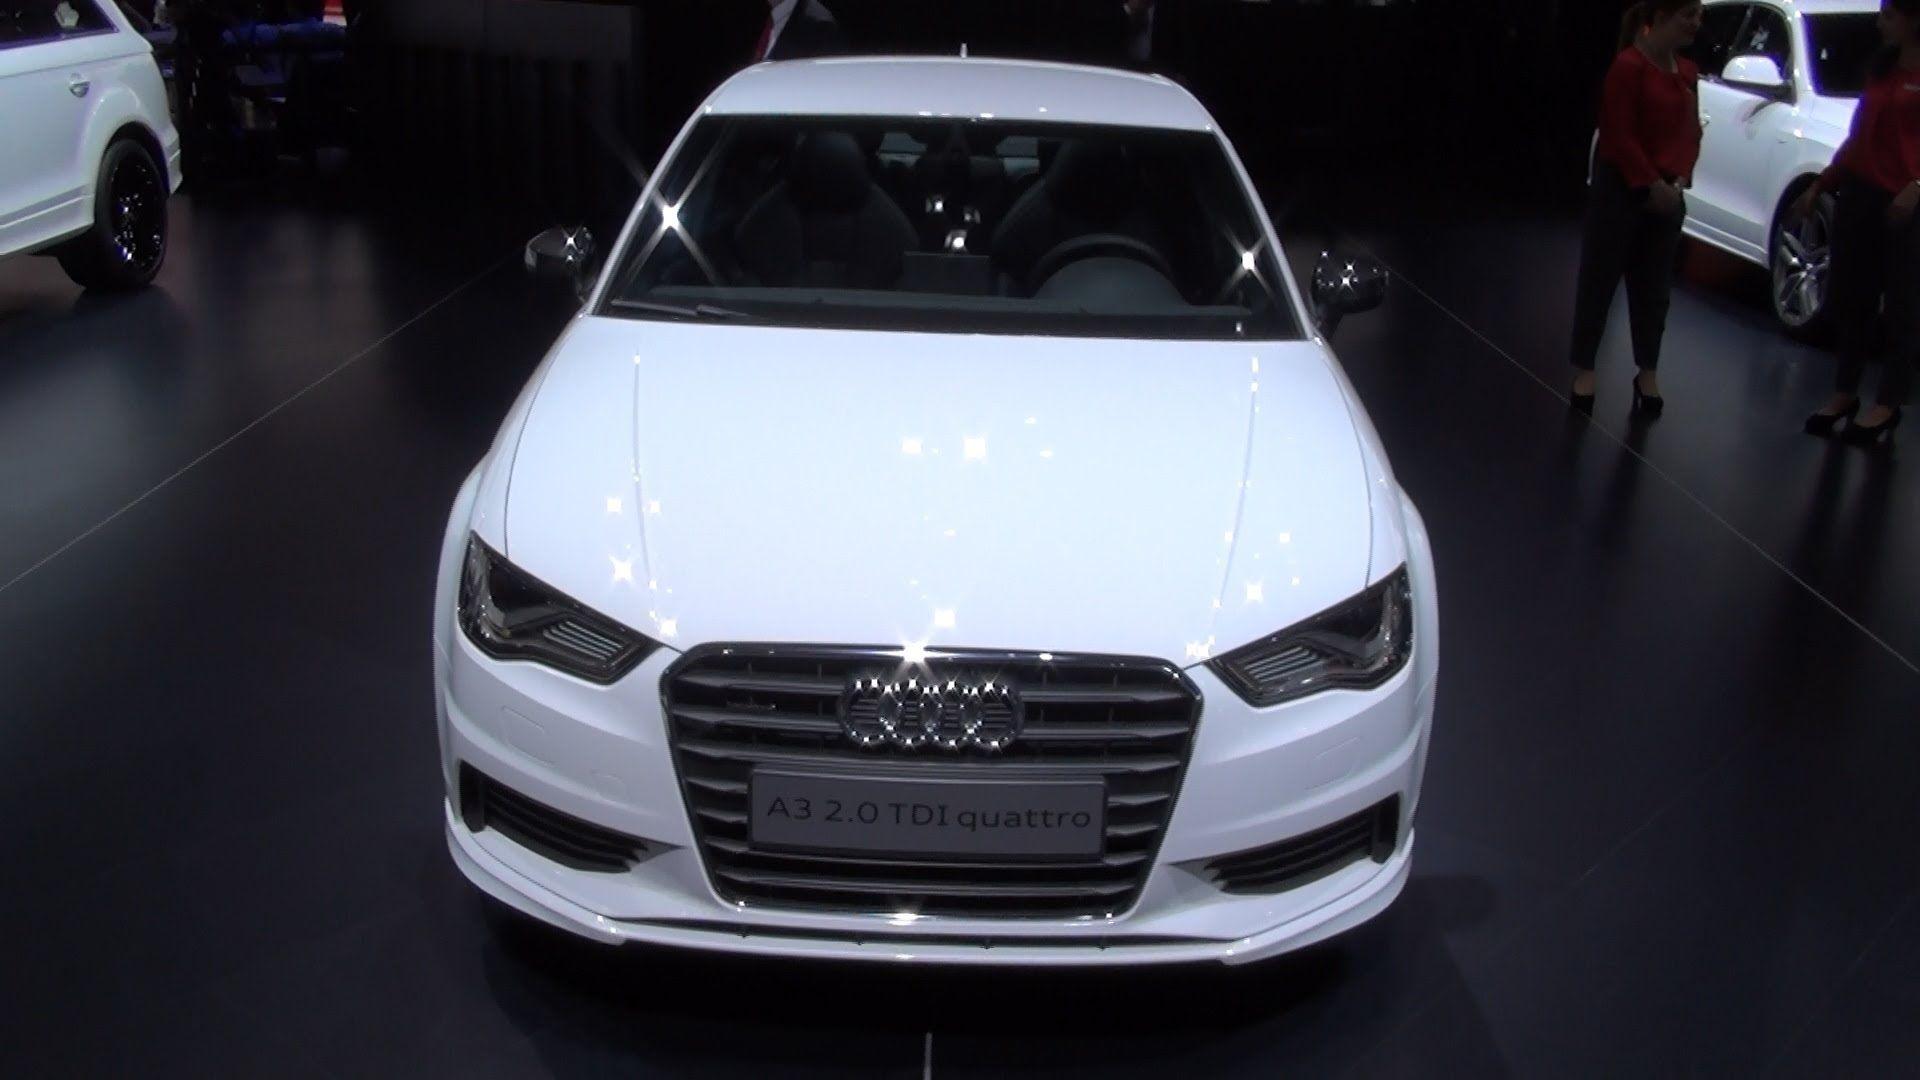 Audi A3 2 0 Tdi Quattro Audi A3 Audi Tdi